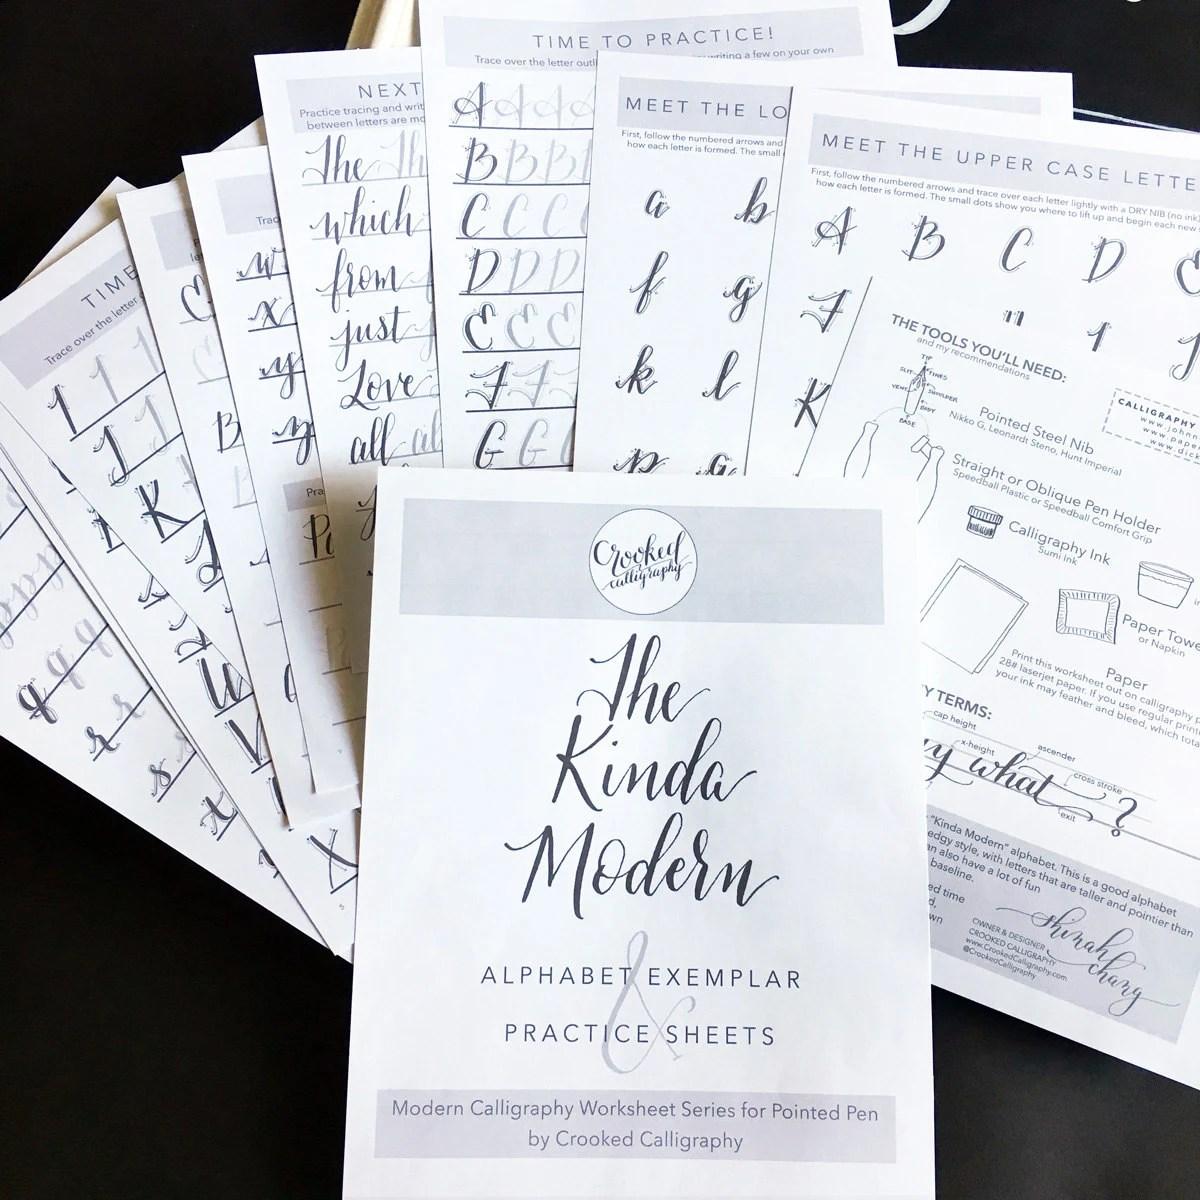 Modern Calligraphy Printable Worksheet